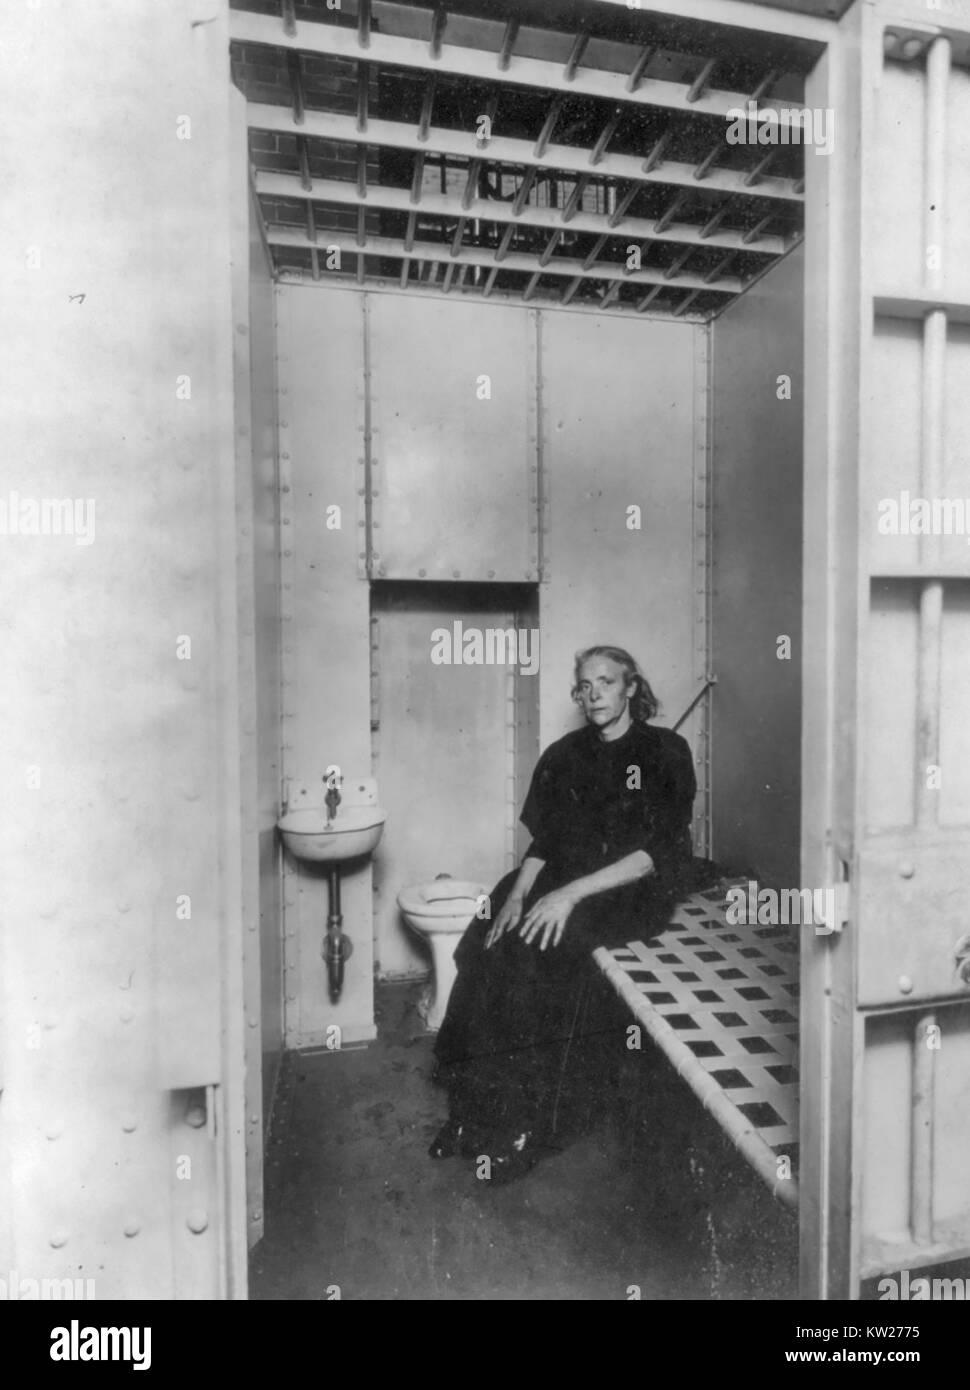 New York City Police Dept., 1909: 'Drunken woman' in new Tenderloin station cell, showing cot, toilet bowl, - Stock Image